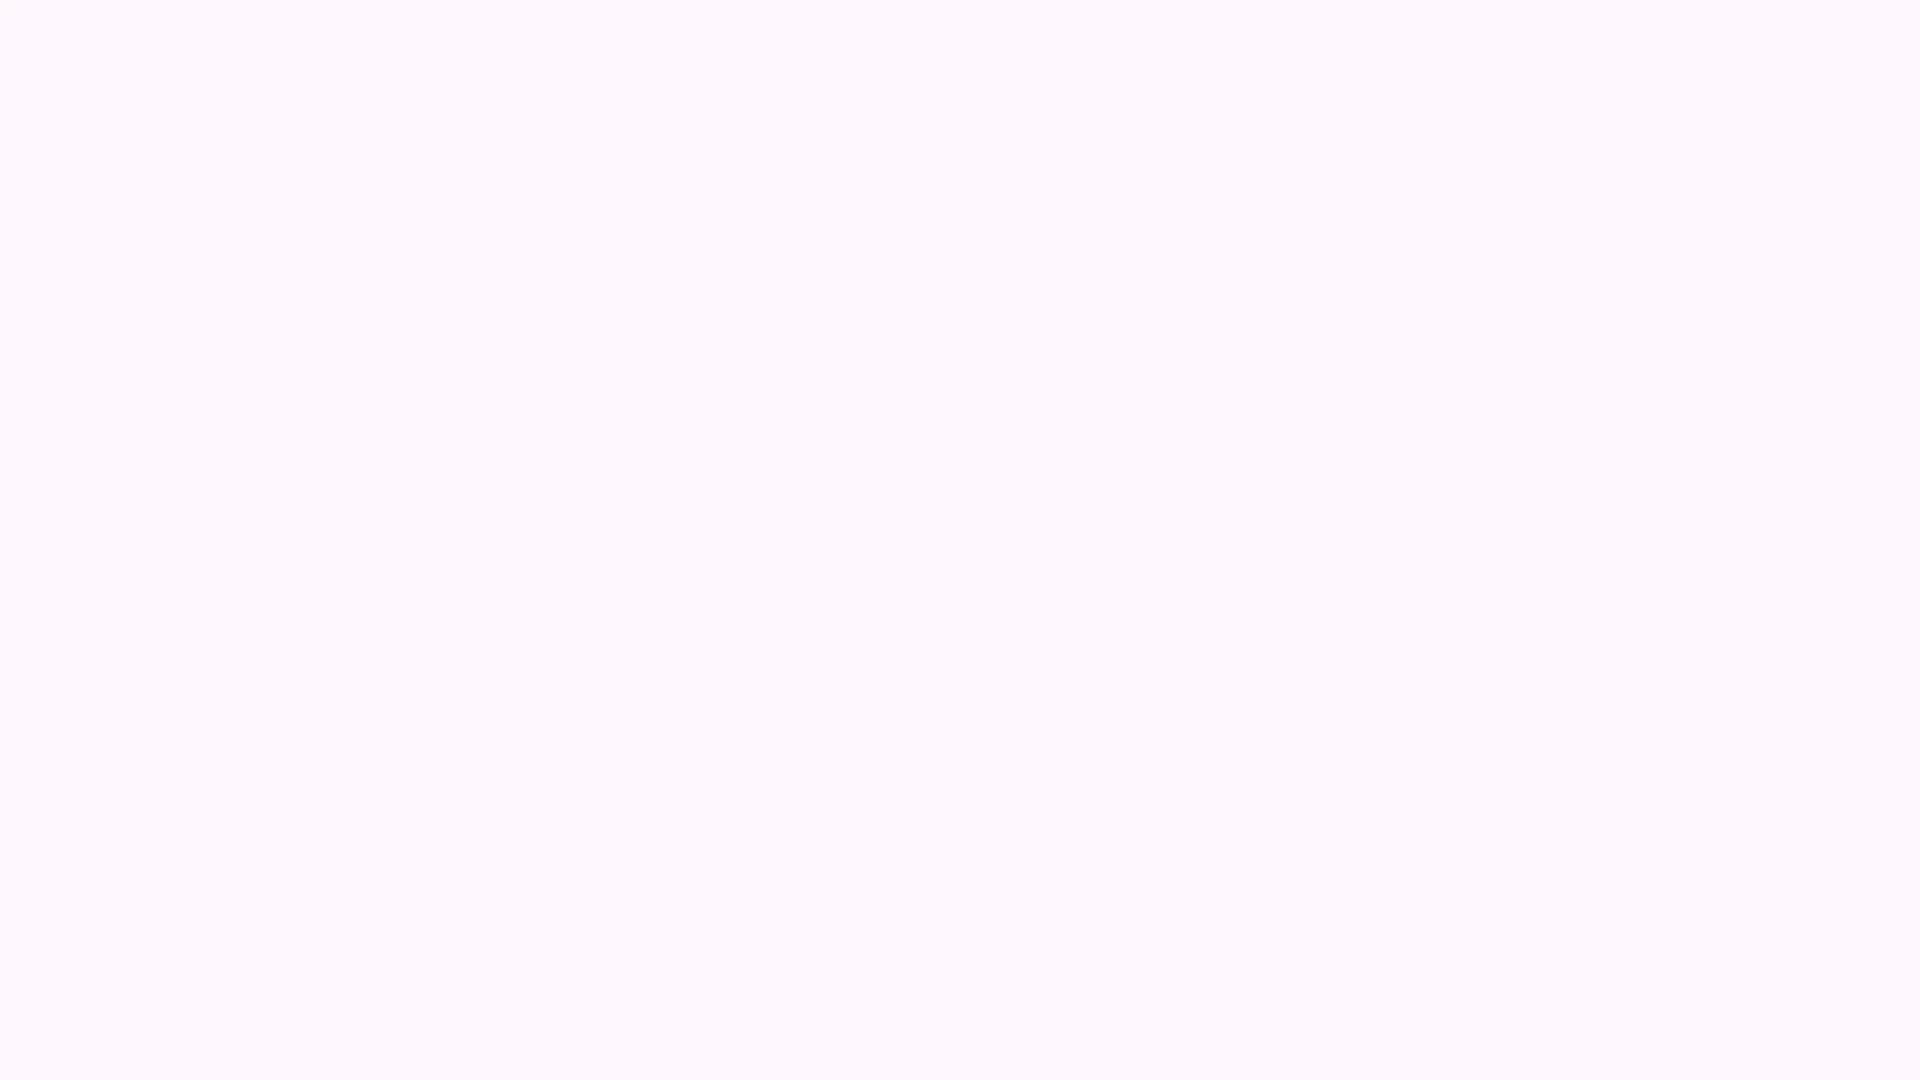 apple, apps, design, device, flat design, ios, ios 10, ios 7, ios7, iphone, johny ive, metro theme, phone, skeumorphism, skeuomorphism, trend, visual metaphor, windows, windows 8, windows8, Skeuomorphism - Leather on your iPhone GIFs